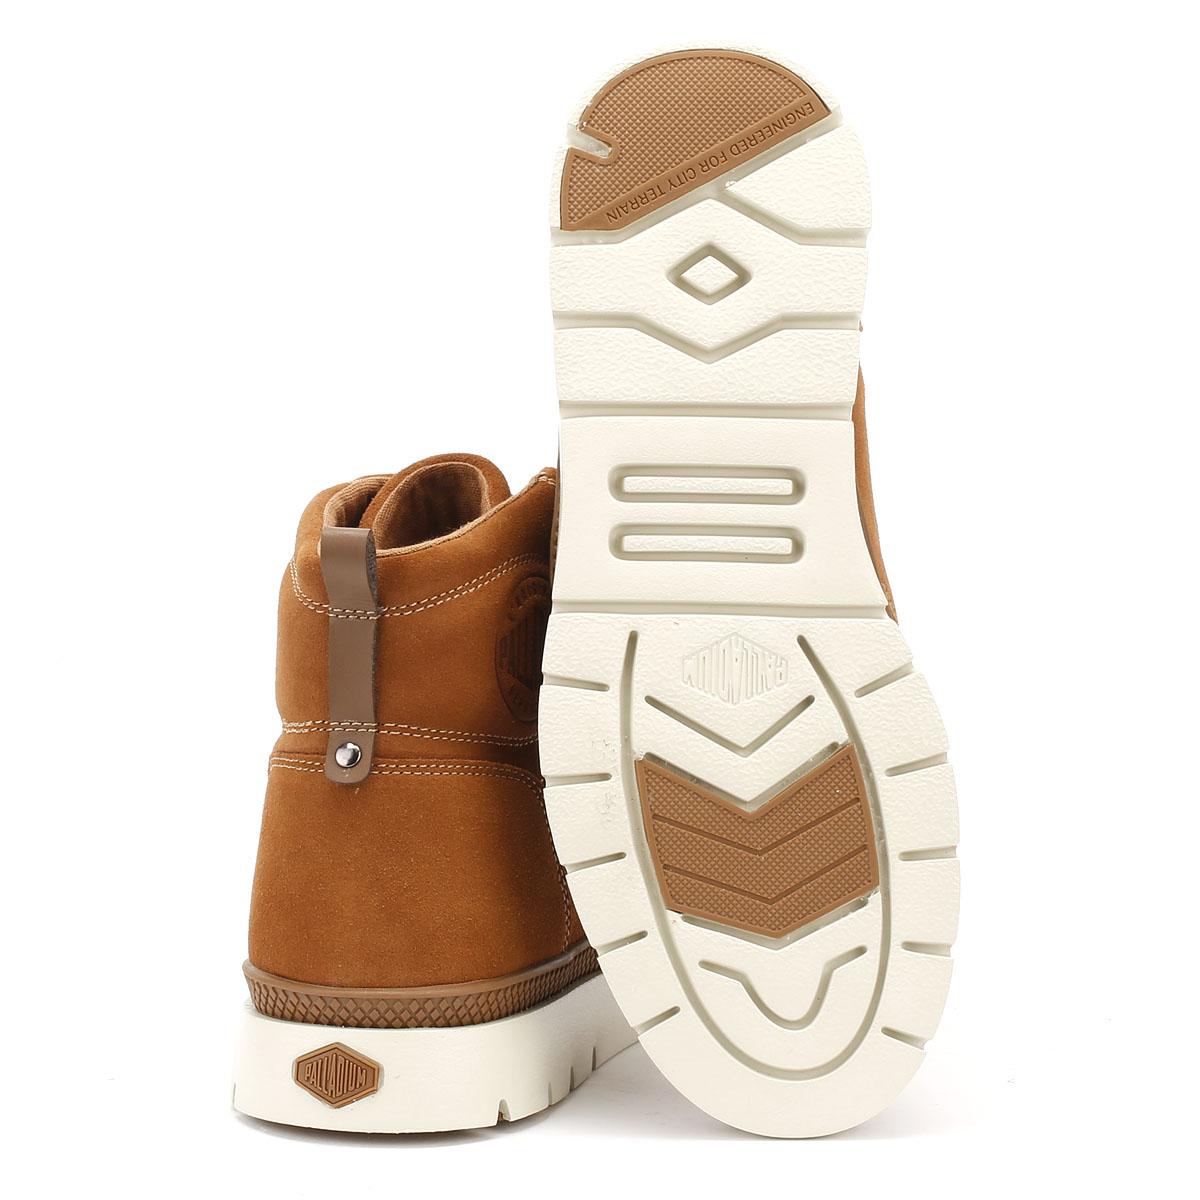 Palladium  Casual Uomo Braun Pallasider Mid Stiefel Suede Casual  Winter Ankle Schuhes 483149